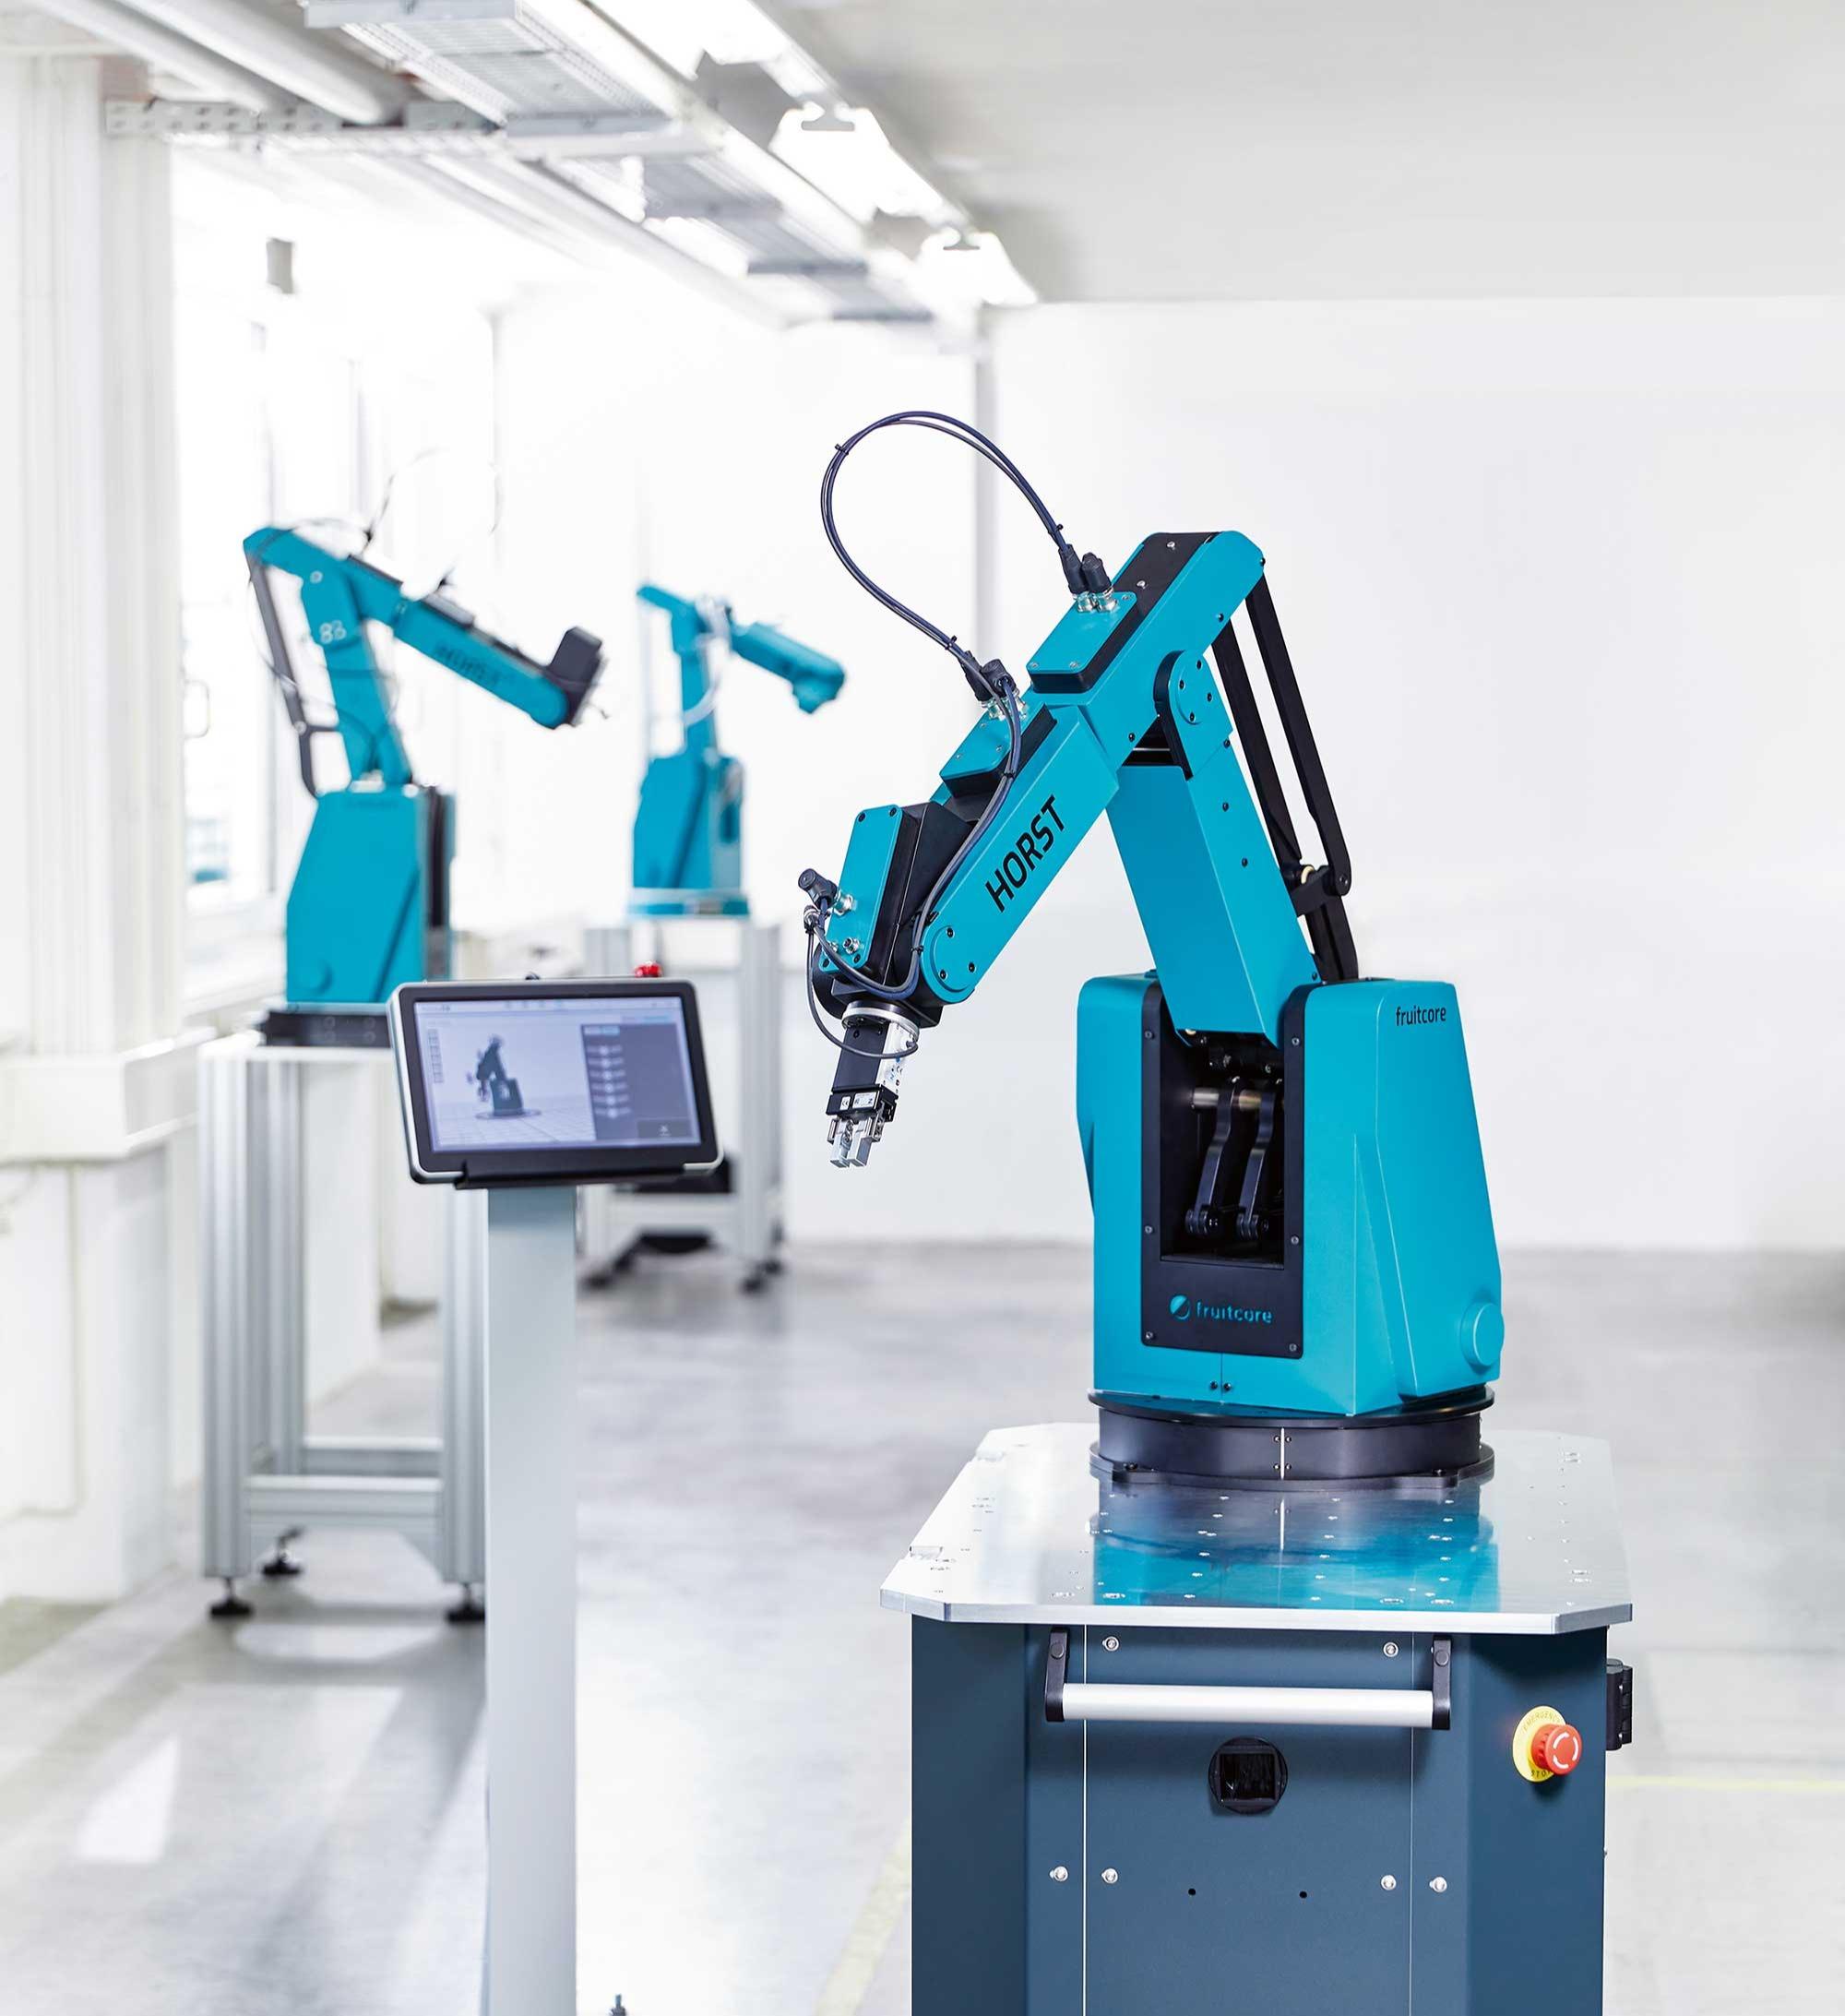 fruitcore-robotics-Robotersystem-HORST-2